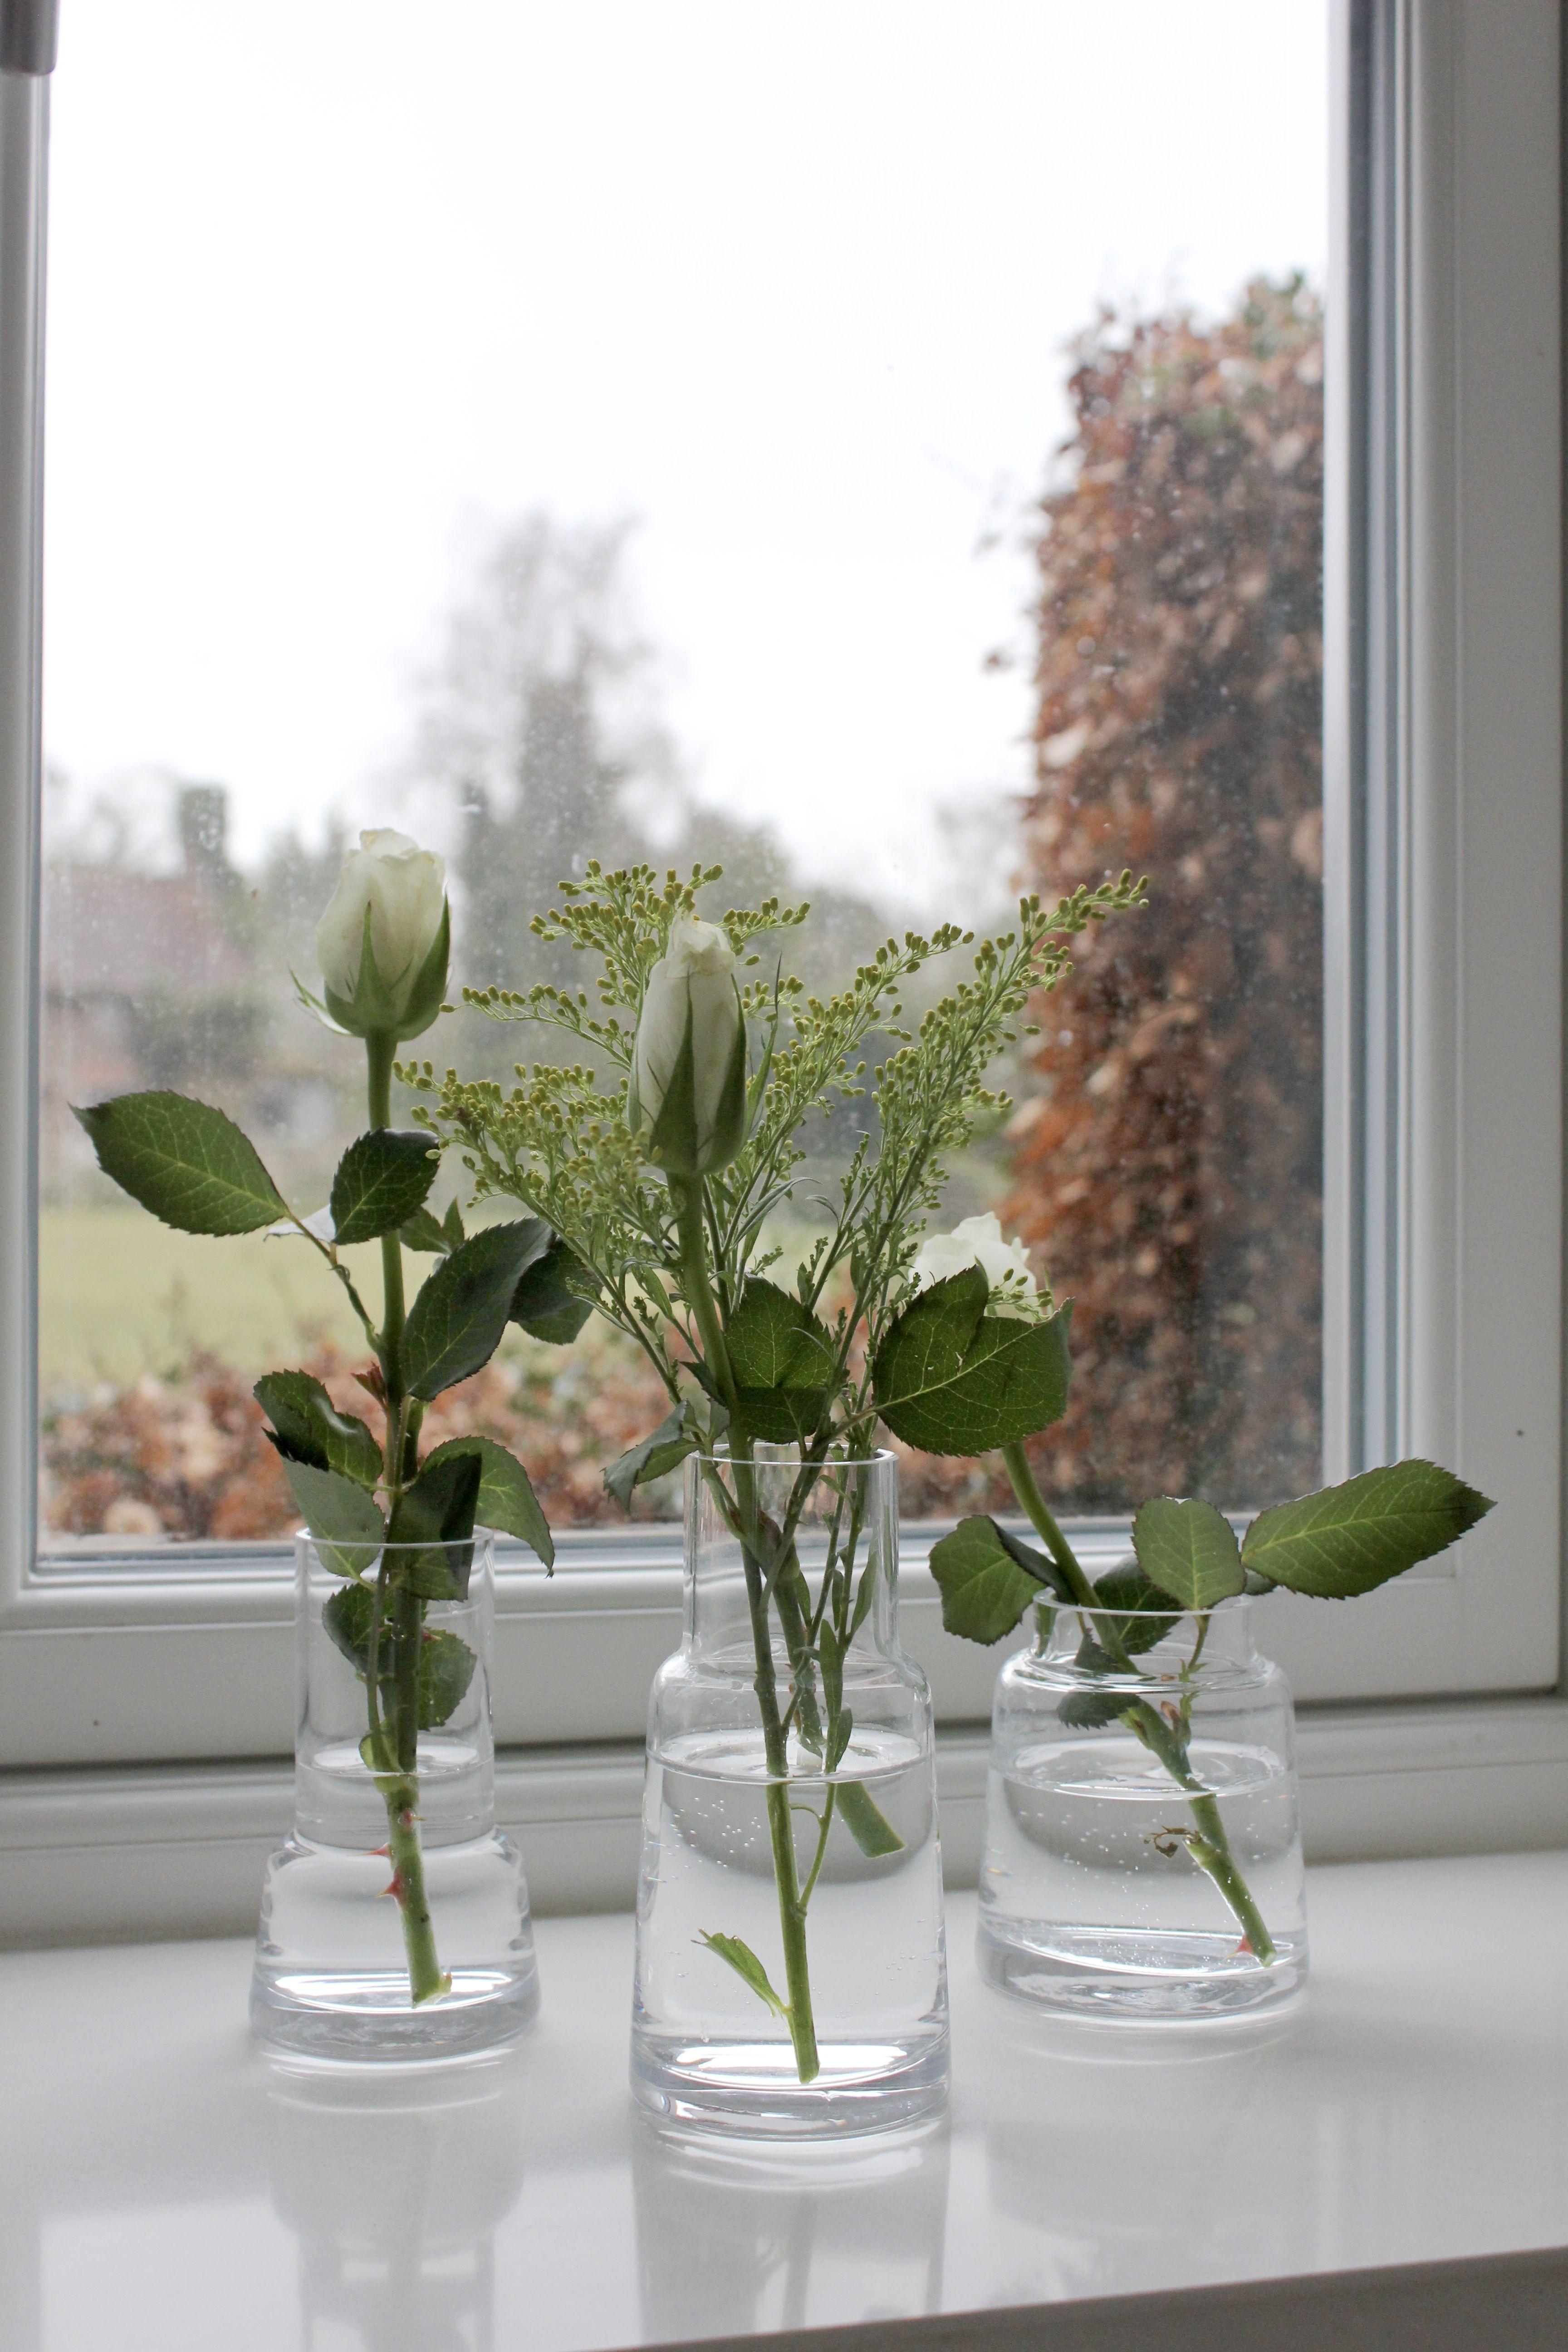 Lsa Mini Vase Trio In 2019 Diy Garden Projects Vase Bud Vases